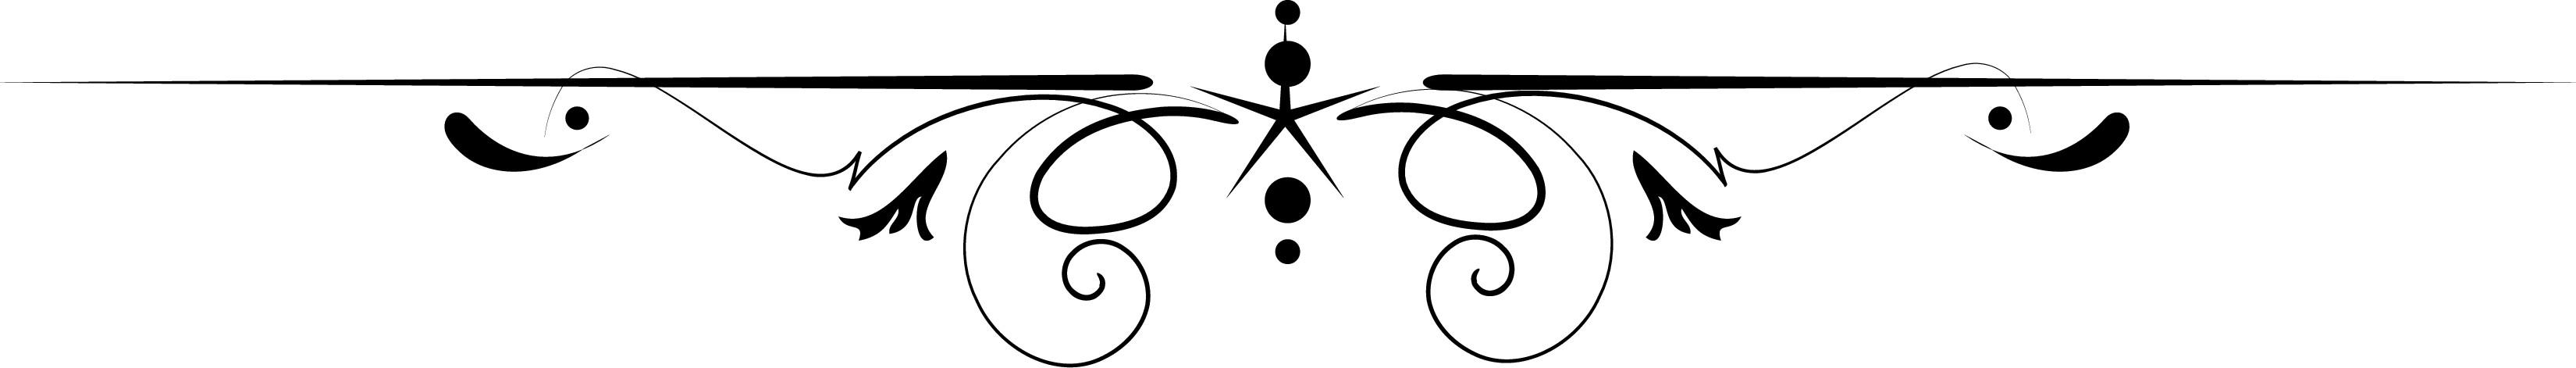 Clip Art Dividers - Clipart Library-Clip Art Dividers - Clipart library-0